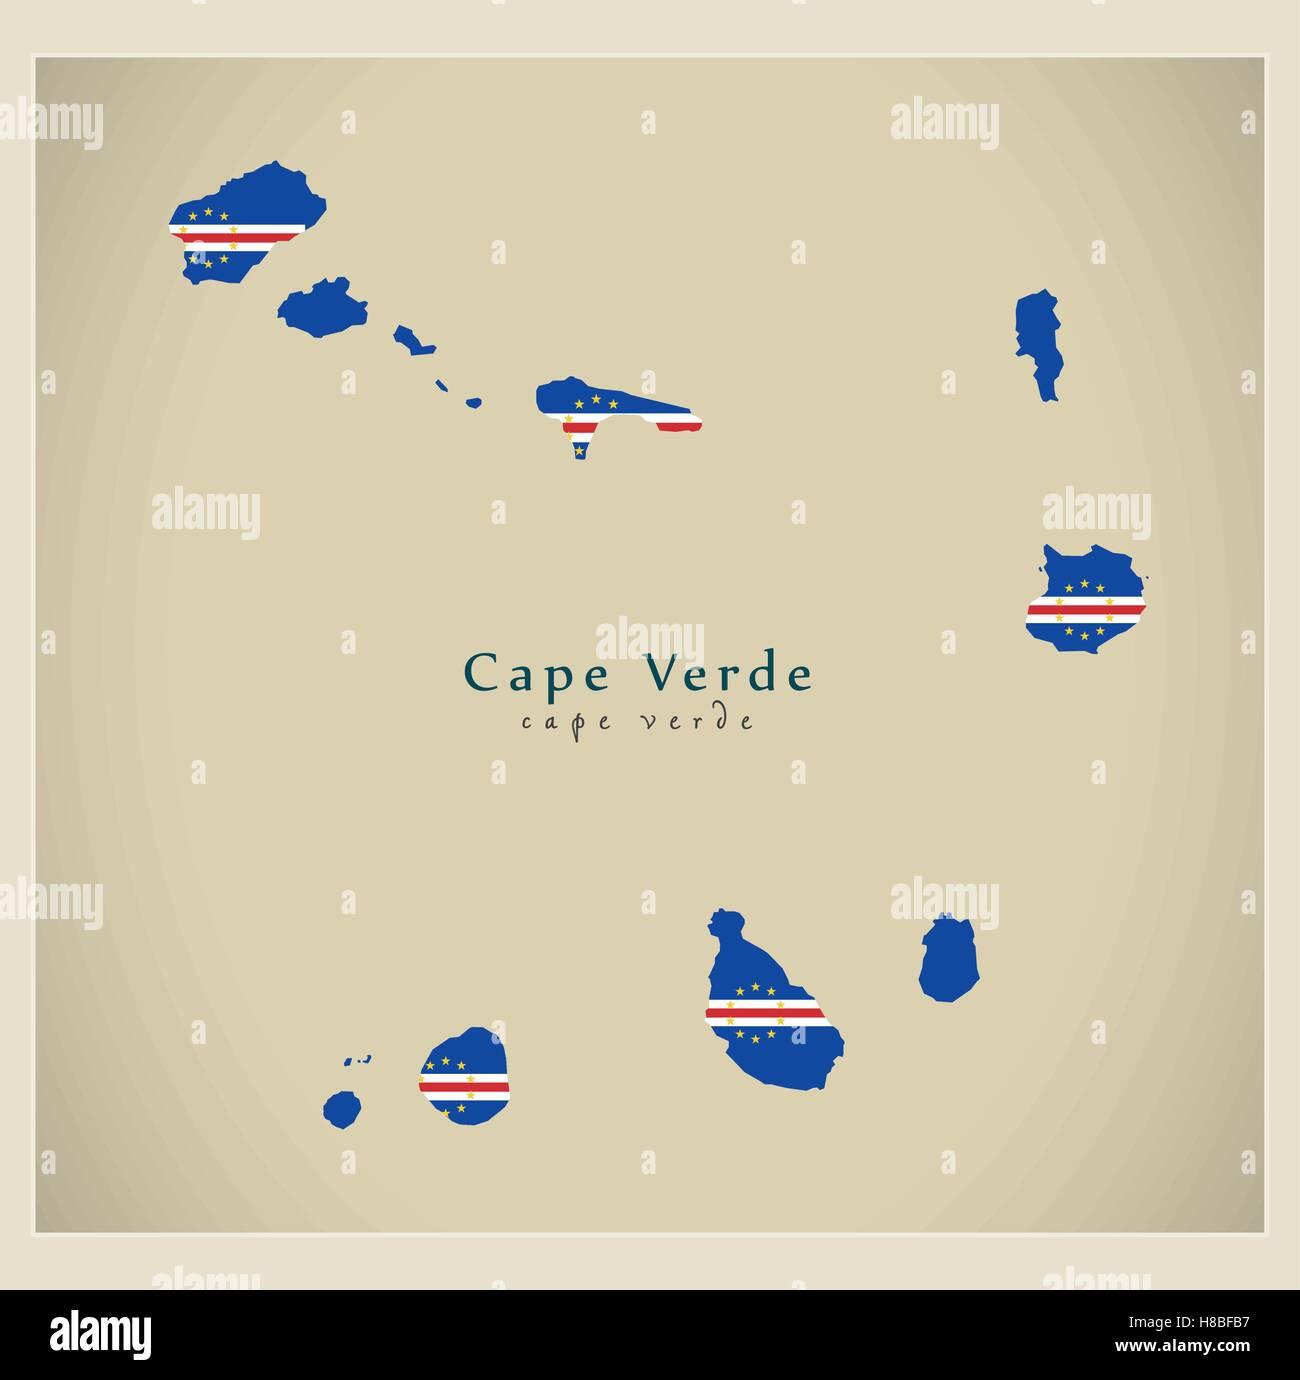 Cape Verde Flag Map Stockfotos & Cape Verde Flag Map Bilder ...